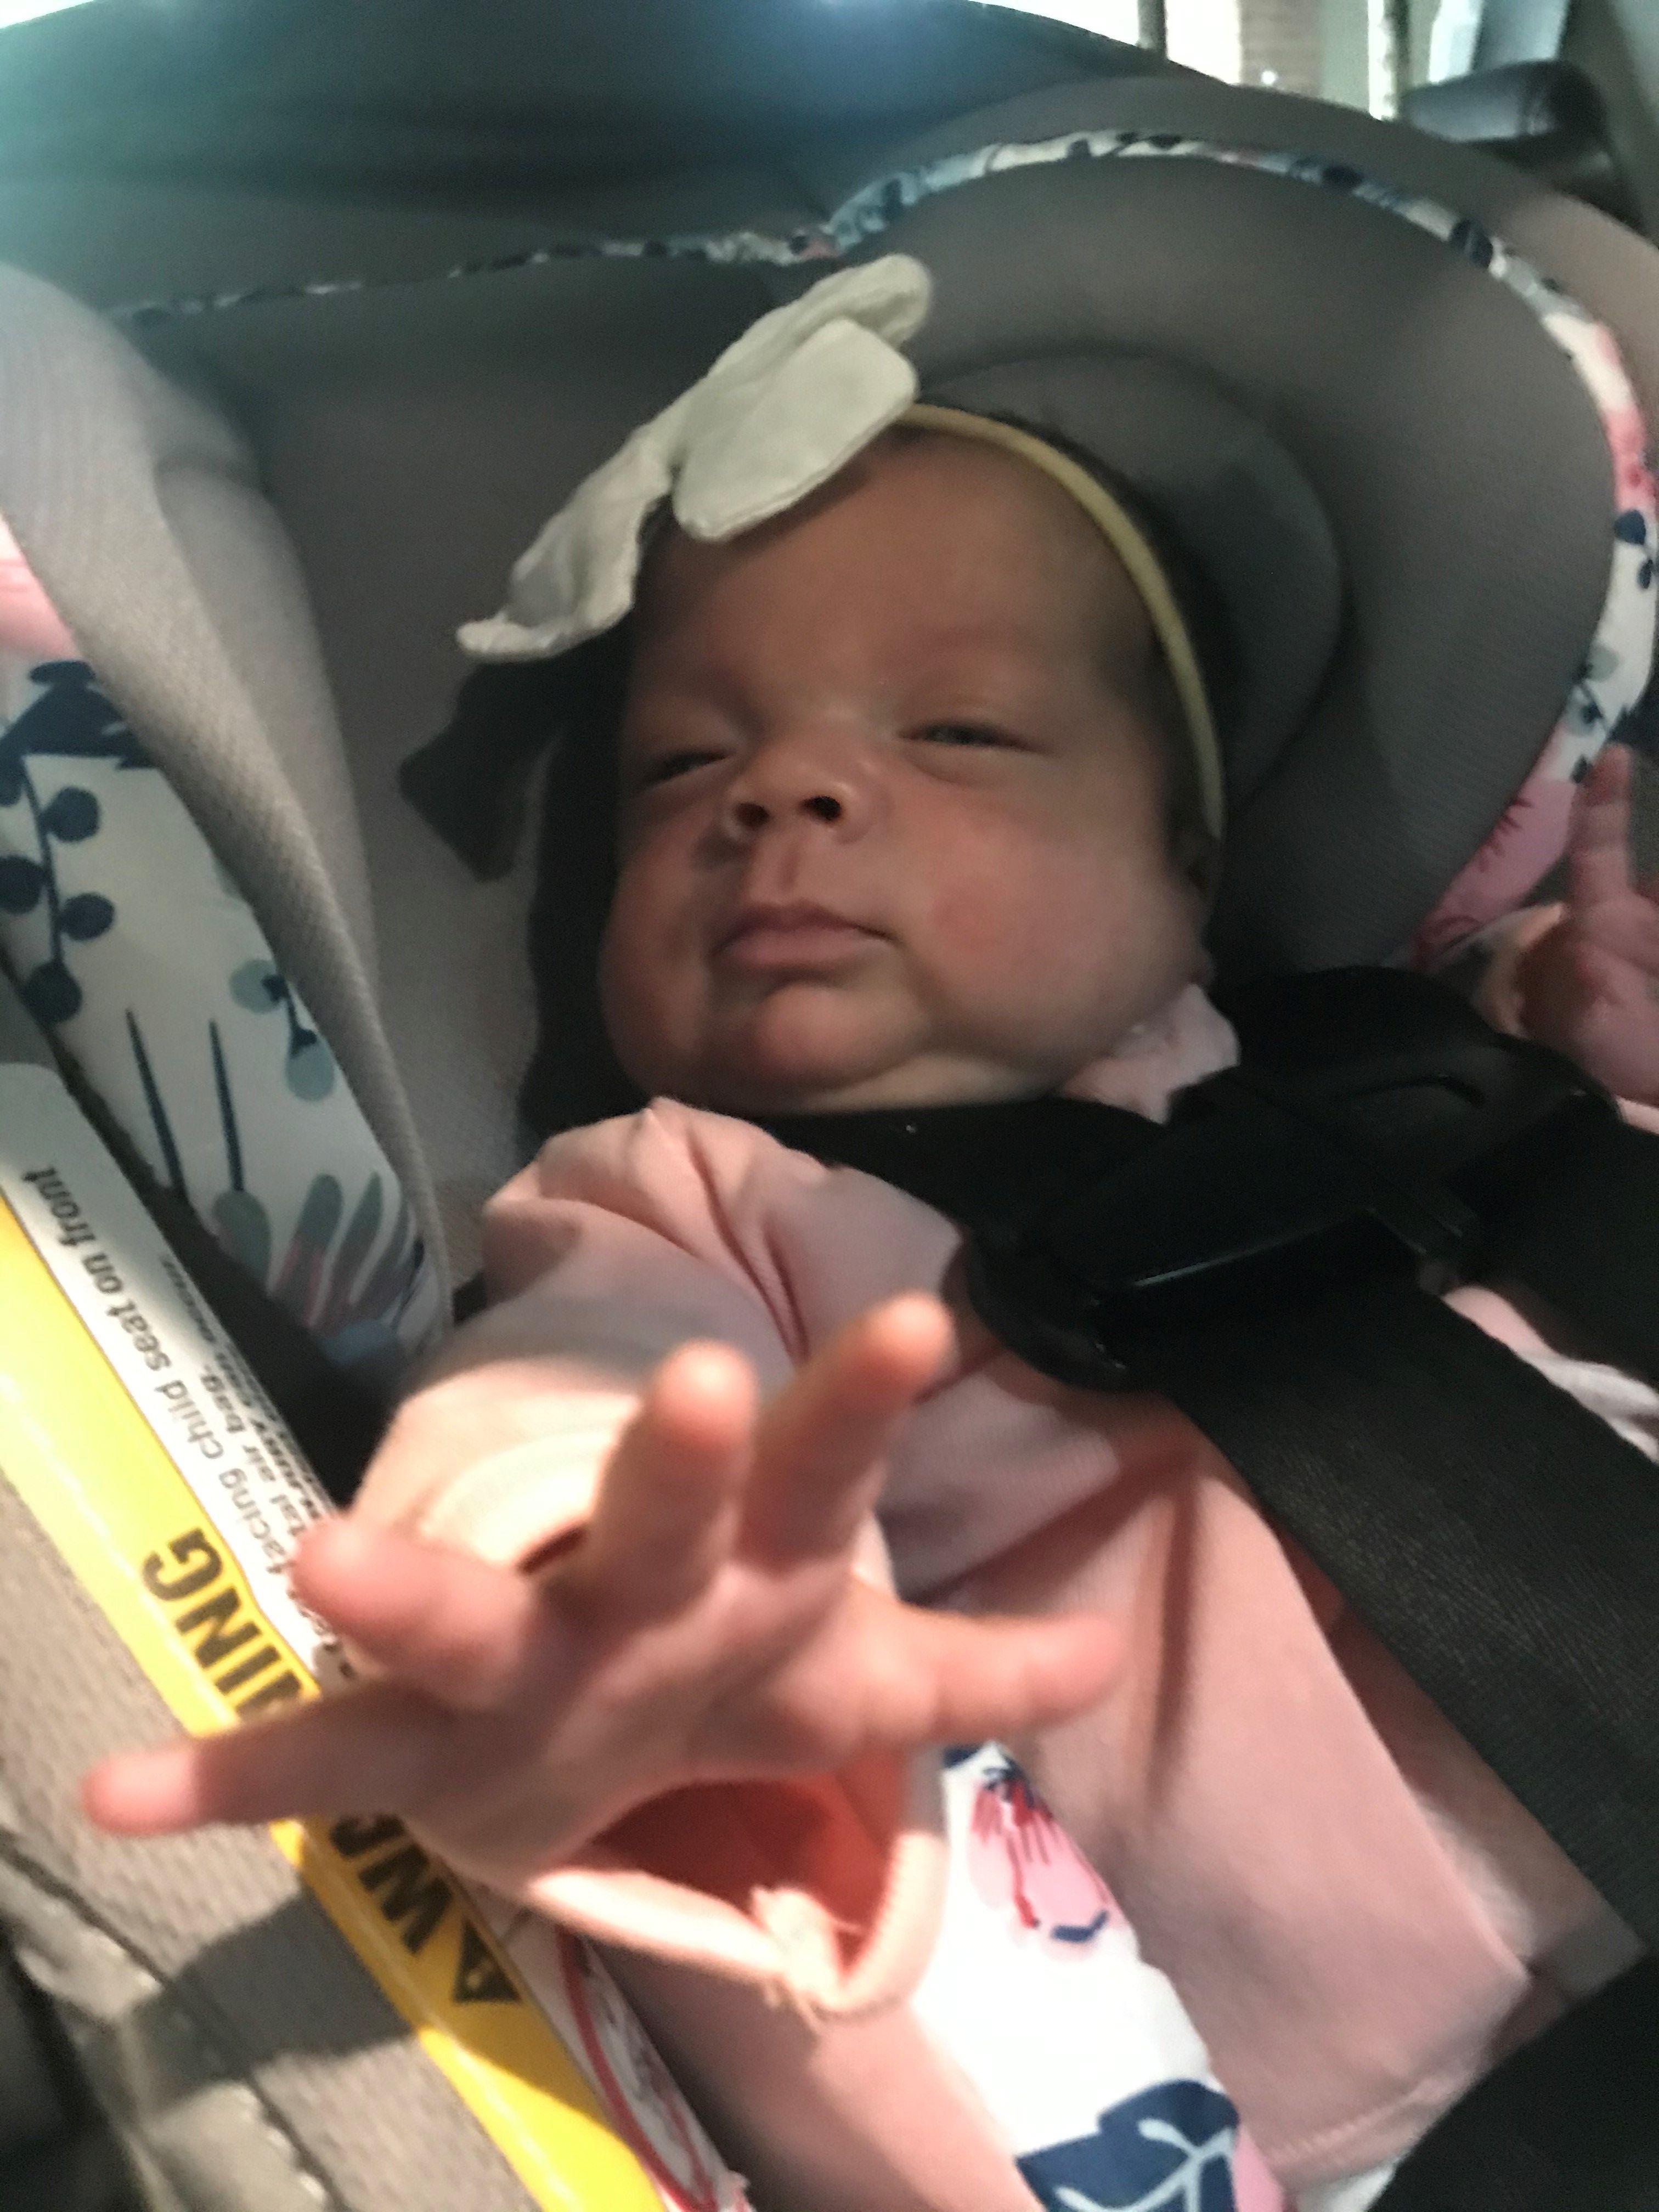 DianaPatient baby.docx